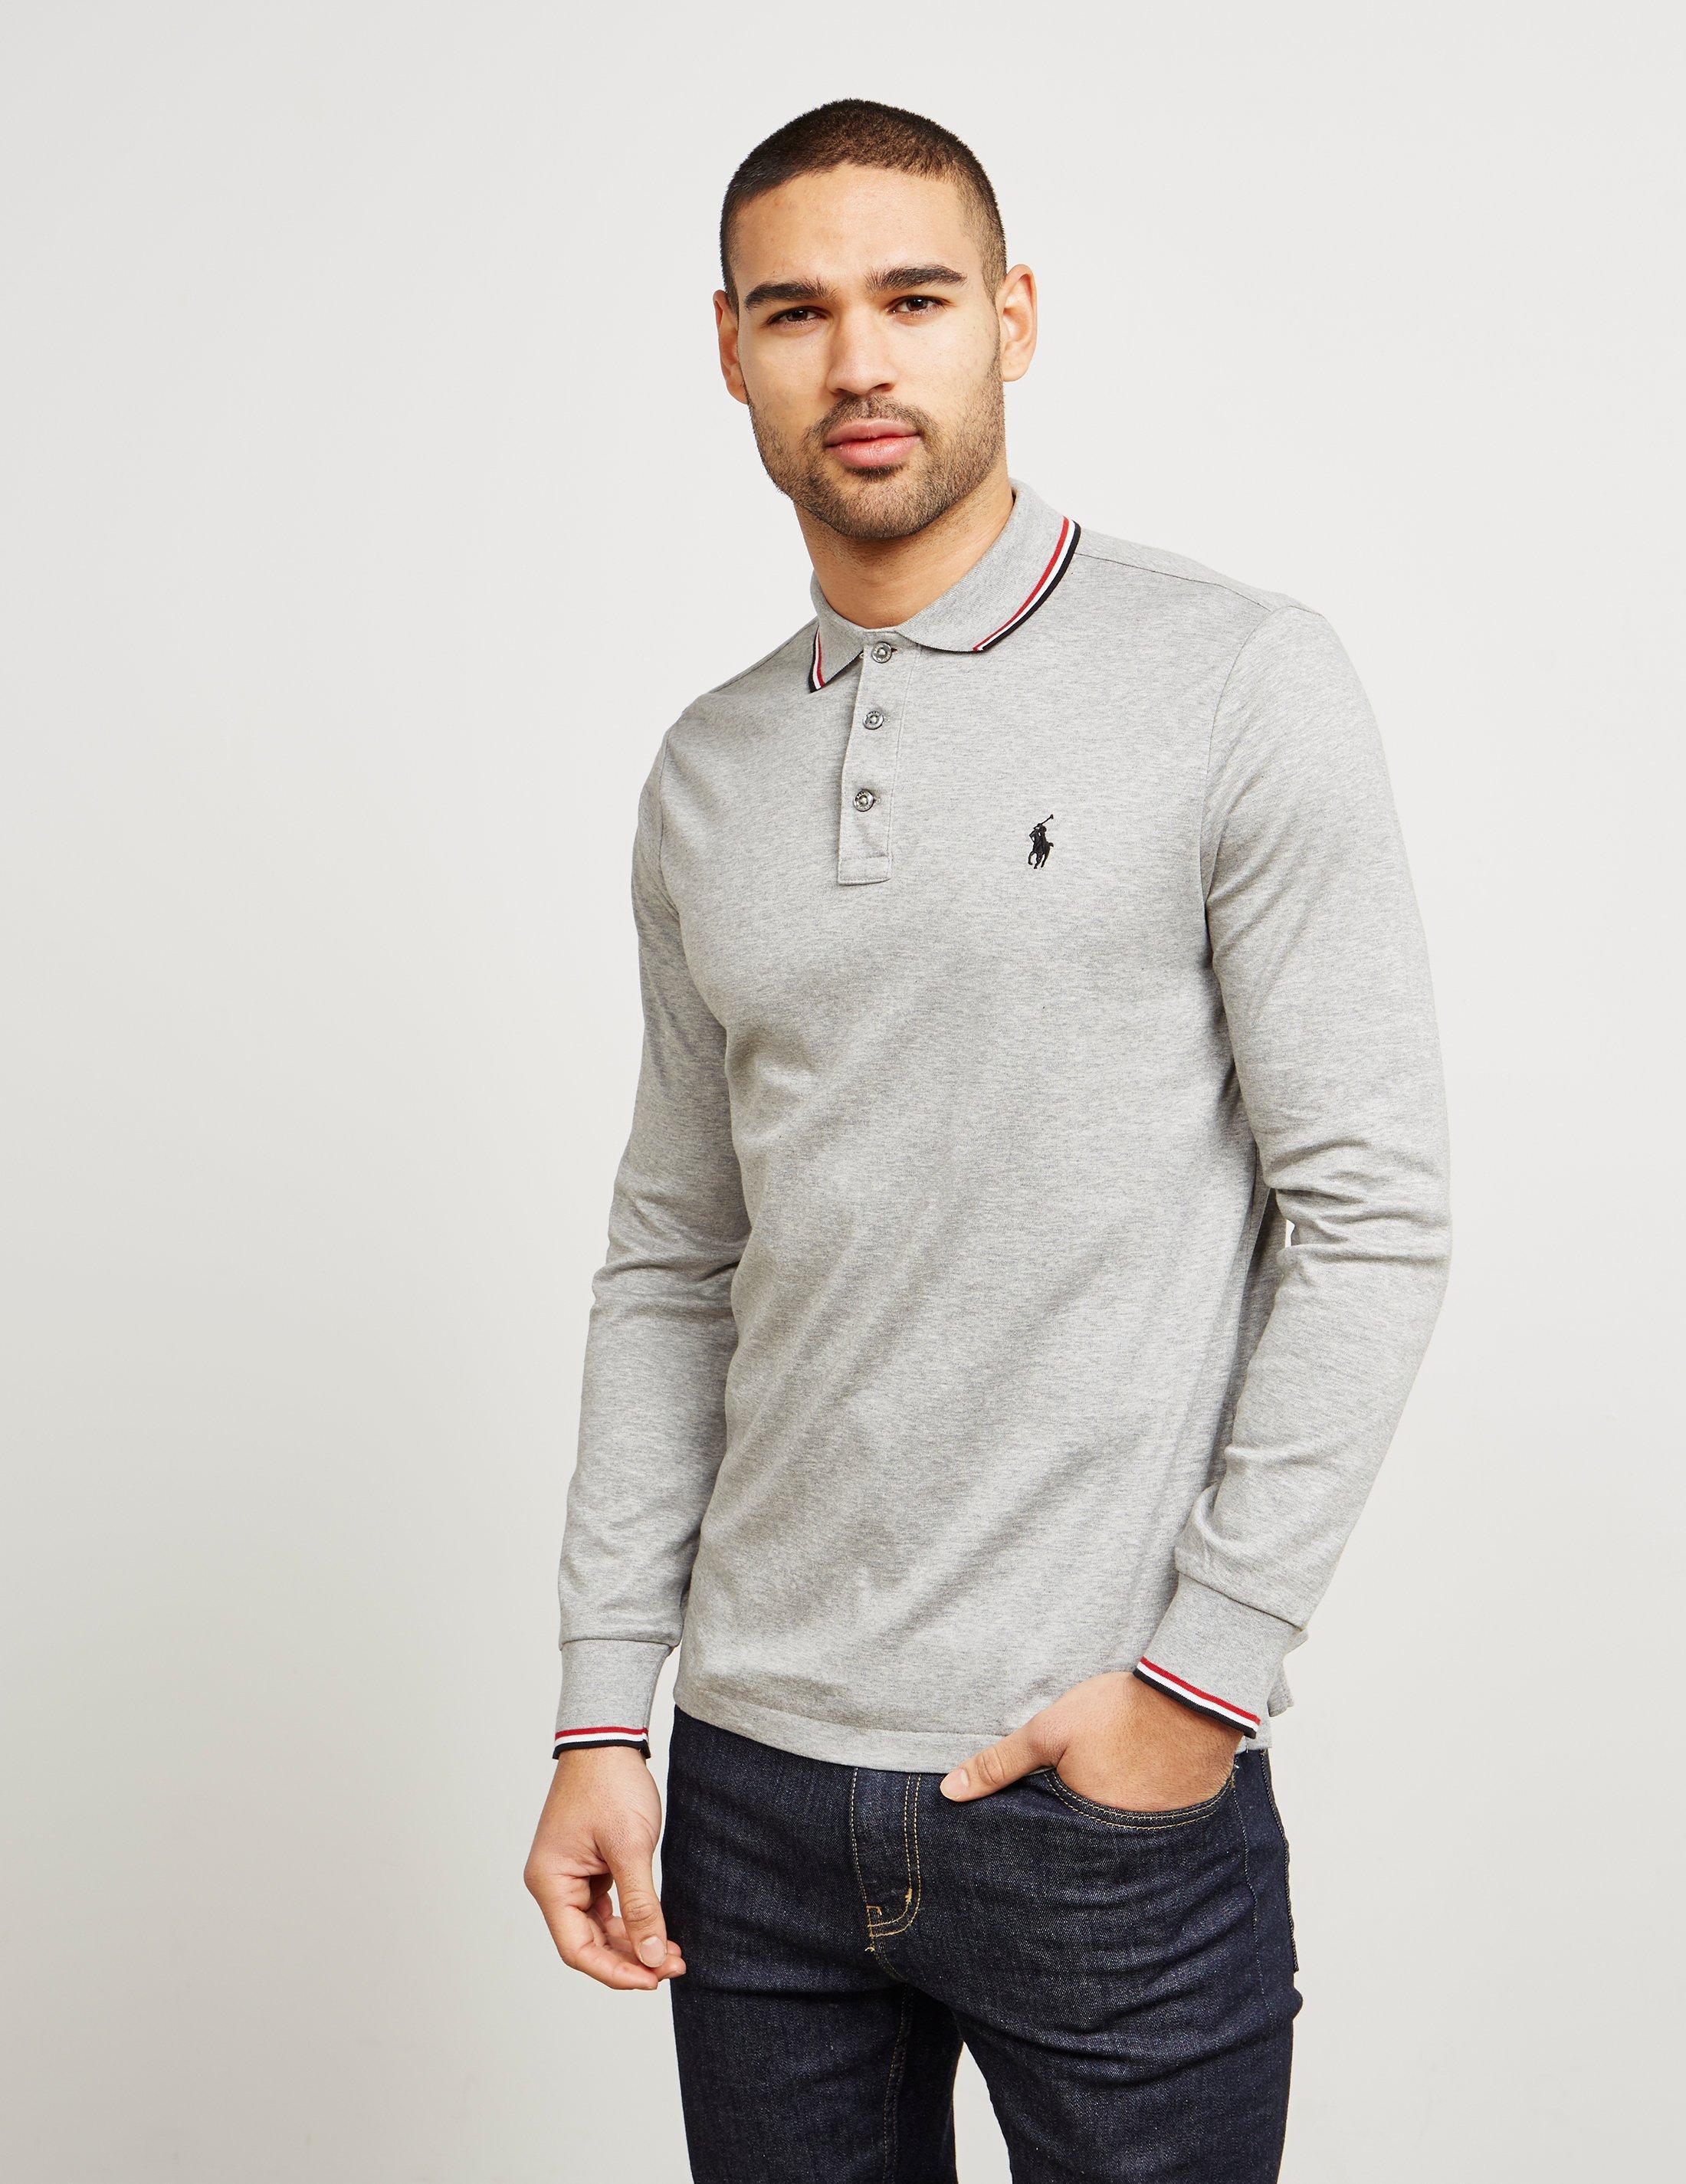 Ralph Lauren Mens Polo Shirts On Sale Rldm